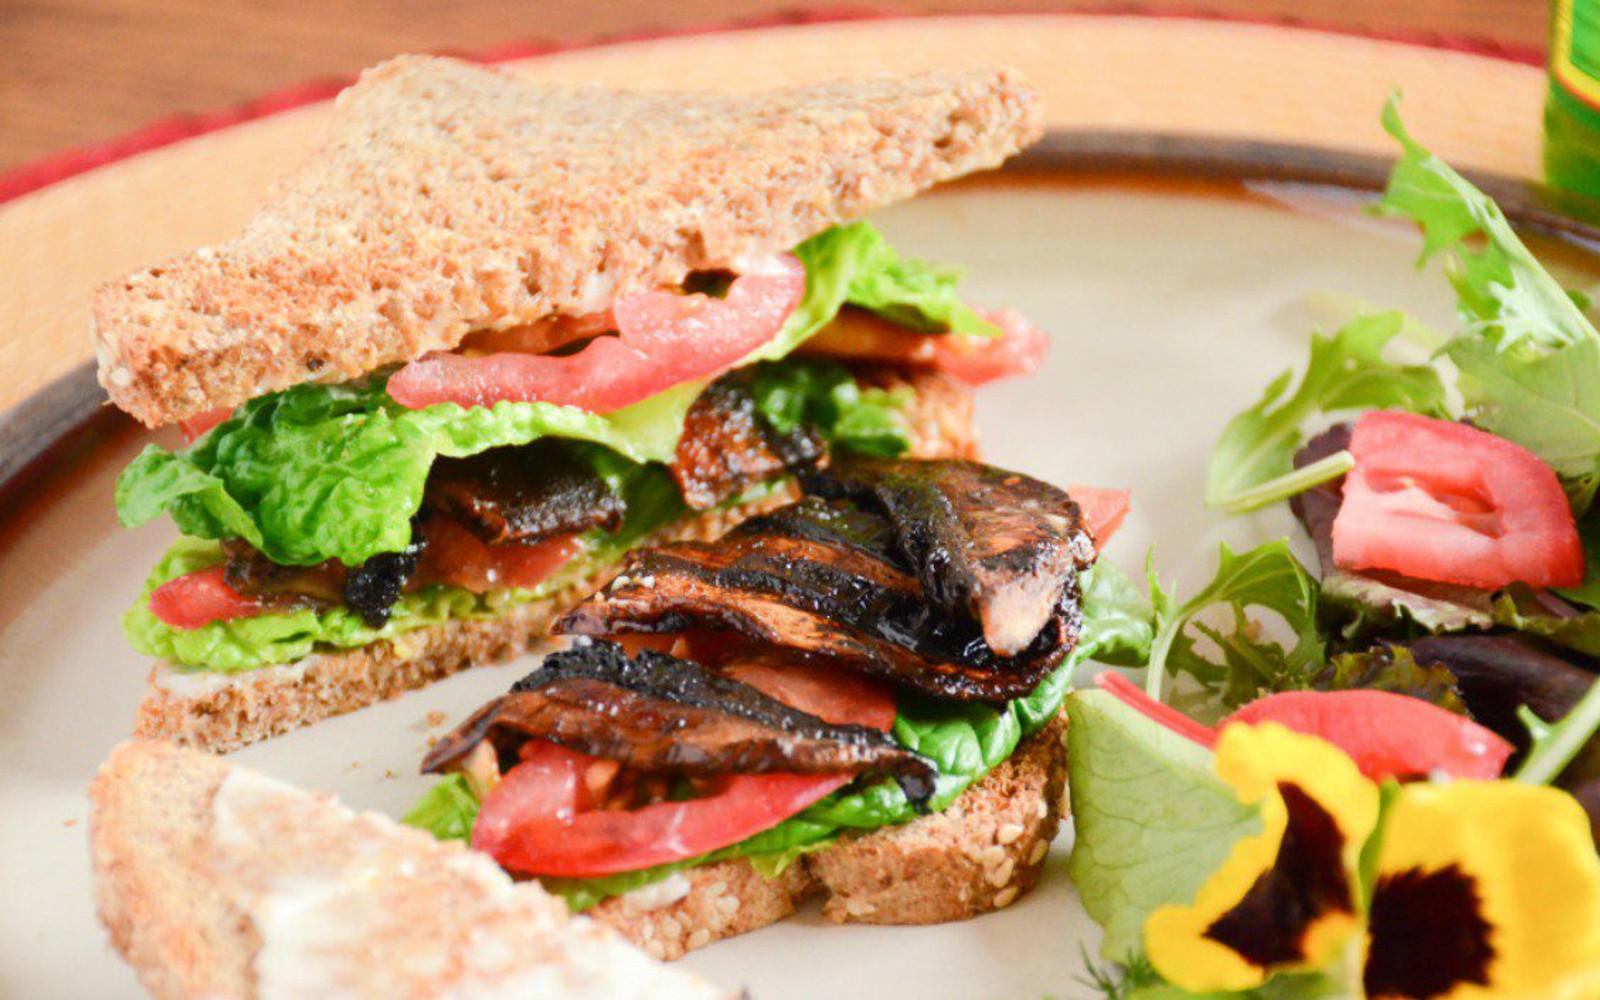 Portobello Mushroom BLT Sandwich